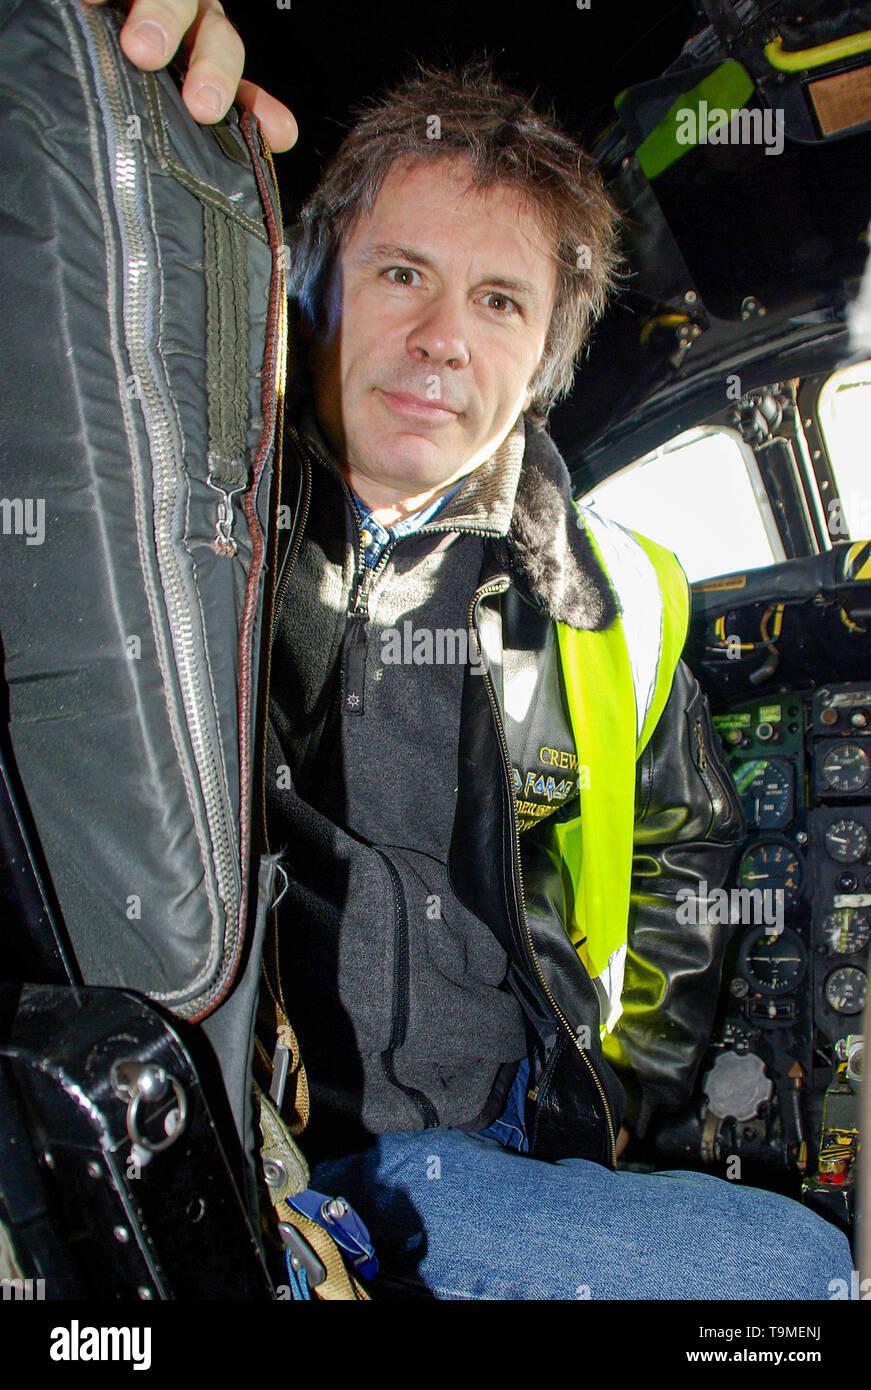 bruce-dickinson-iron-maiden-vocalist-singer-and-pilot-in-the-cockpit-of-an-ex-military-avro-vulcan-jet-bomber-plane-historic-cold-war-bomber-T9MENJ.jpg